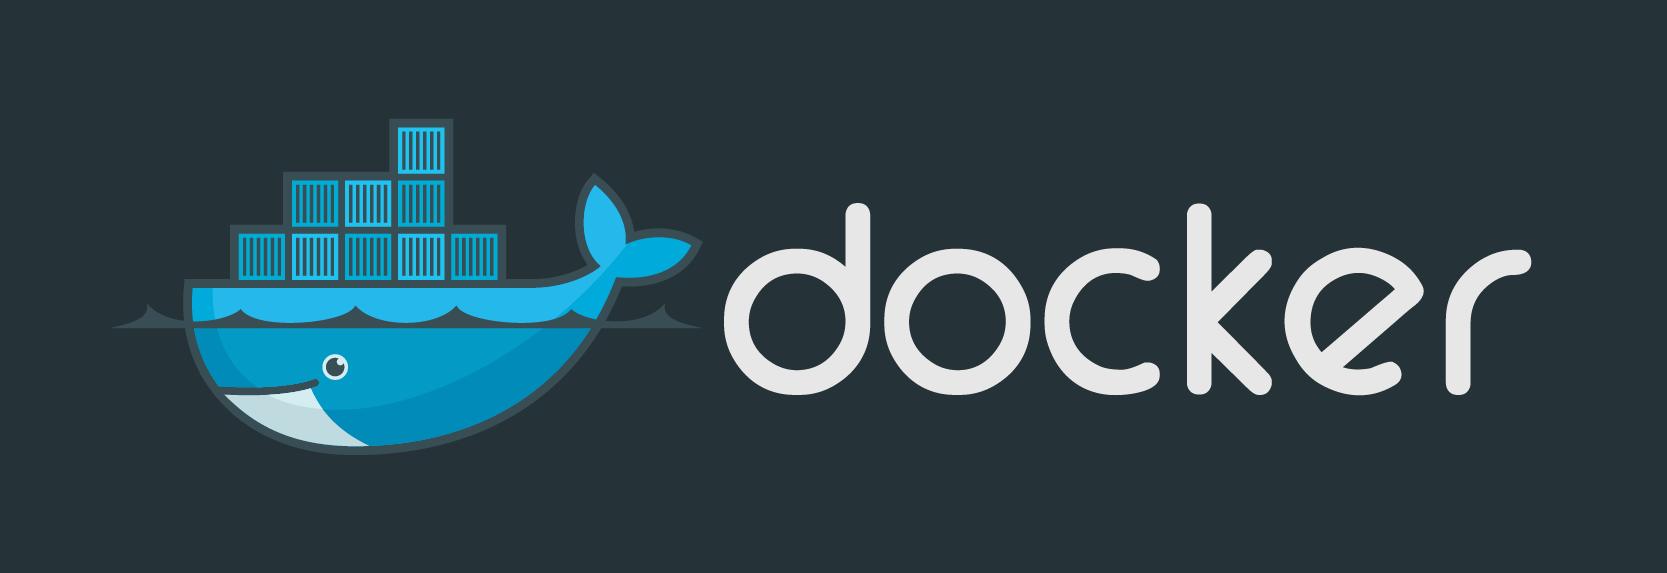 Docker-large_h-dark.png